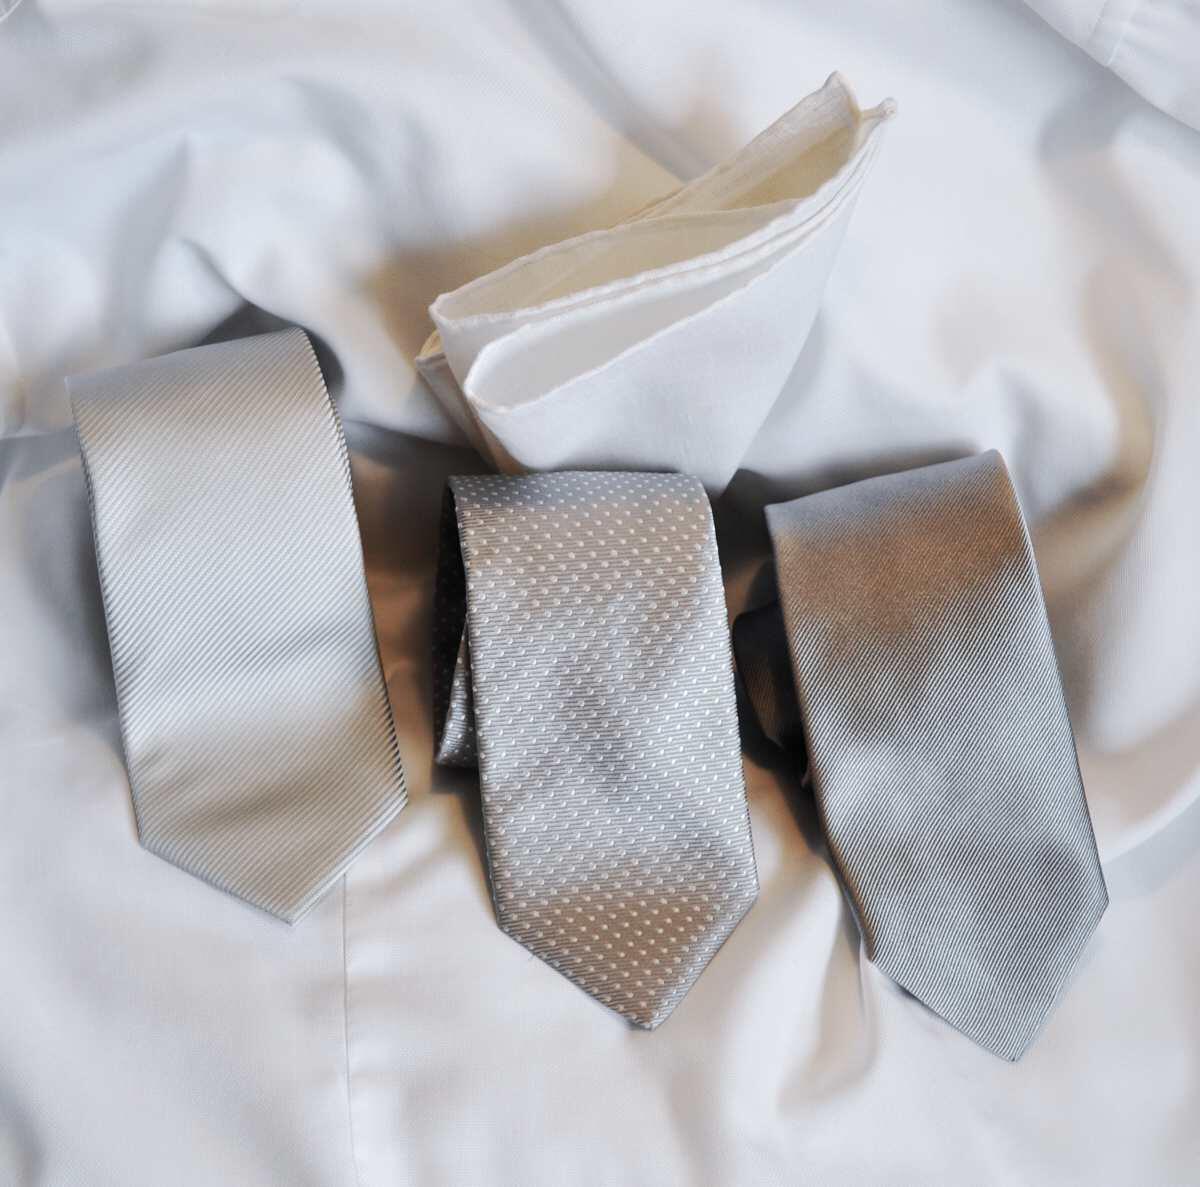 Juhlaan sopivat solmiot